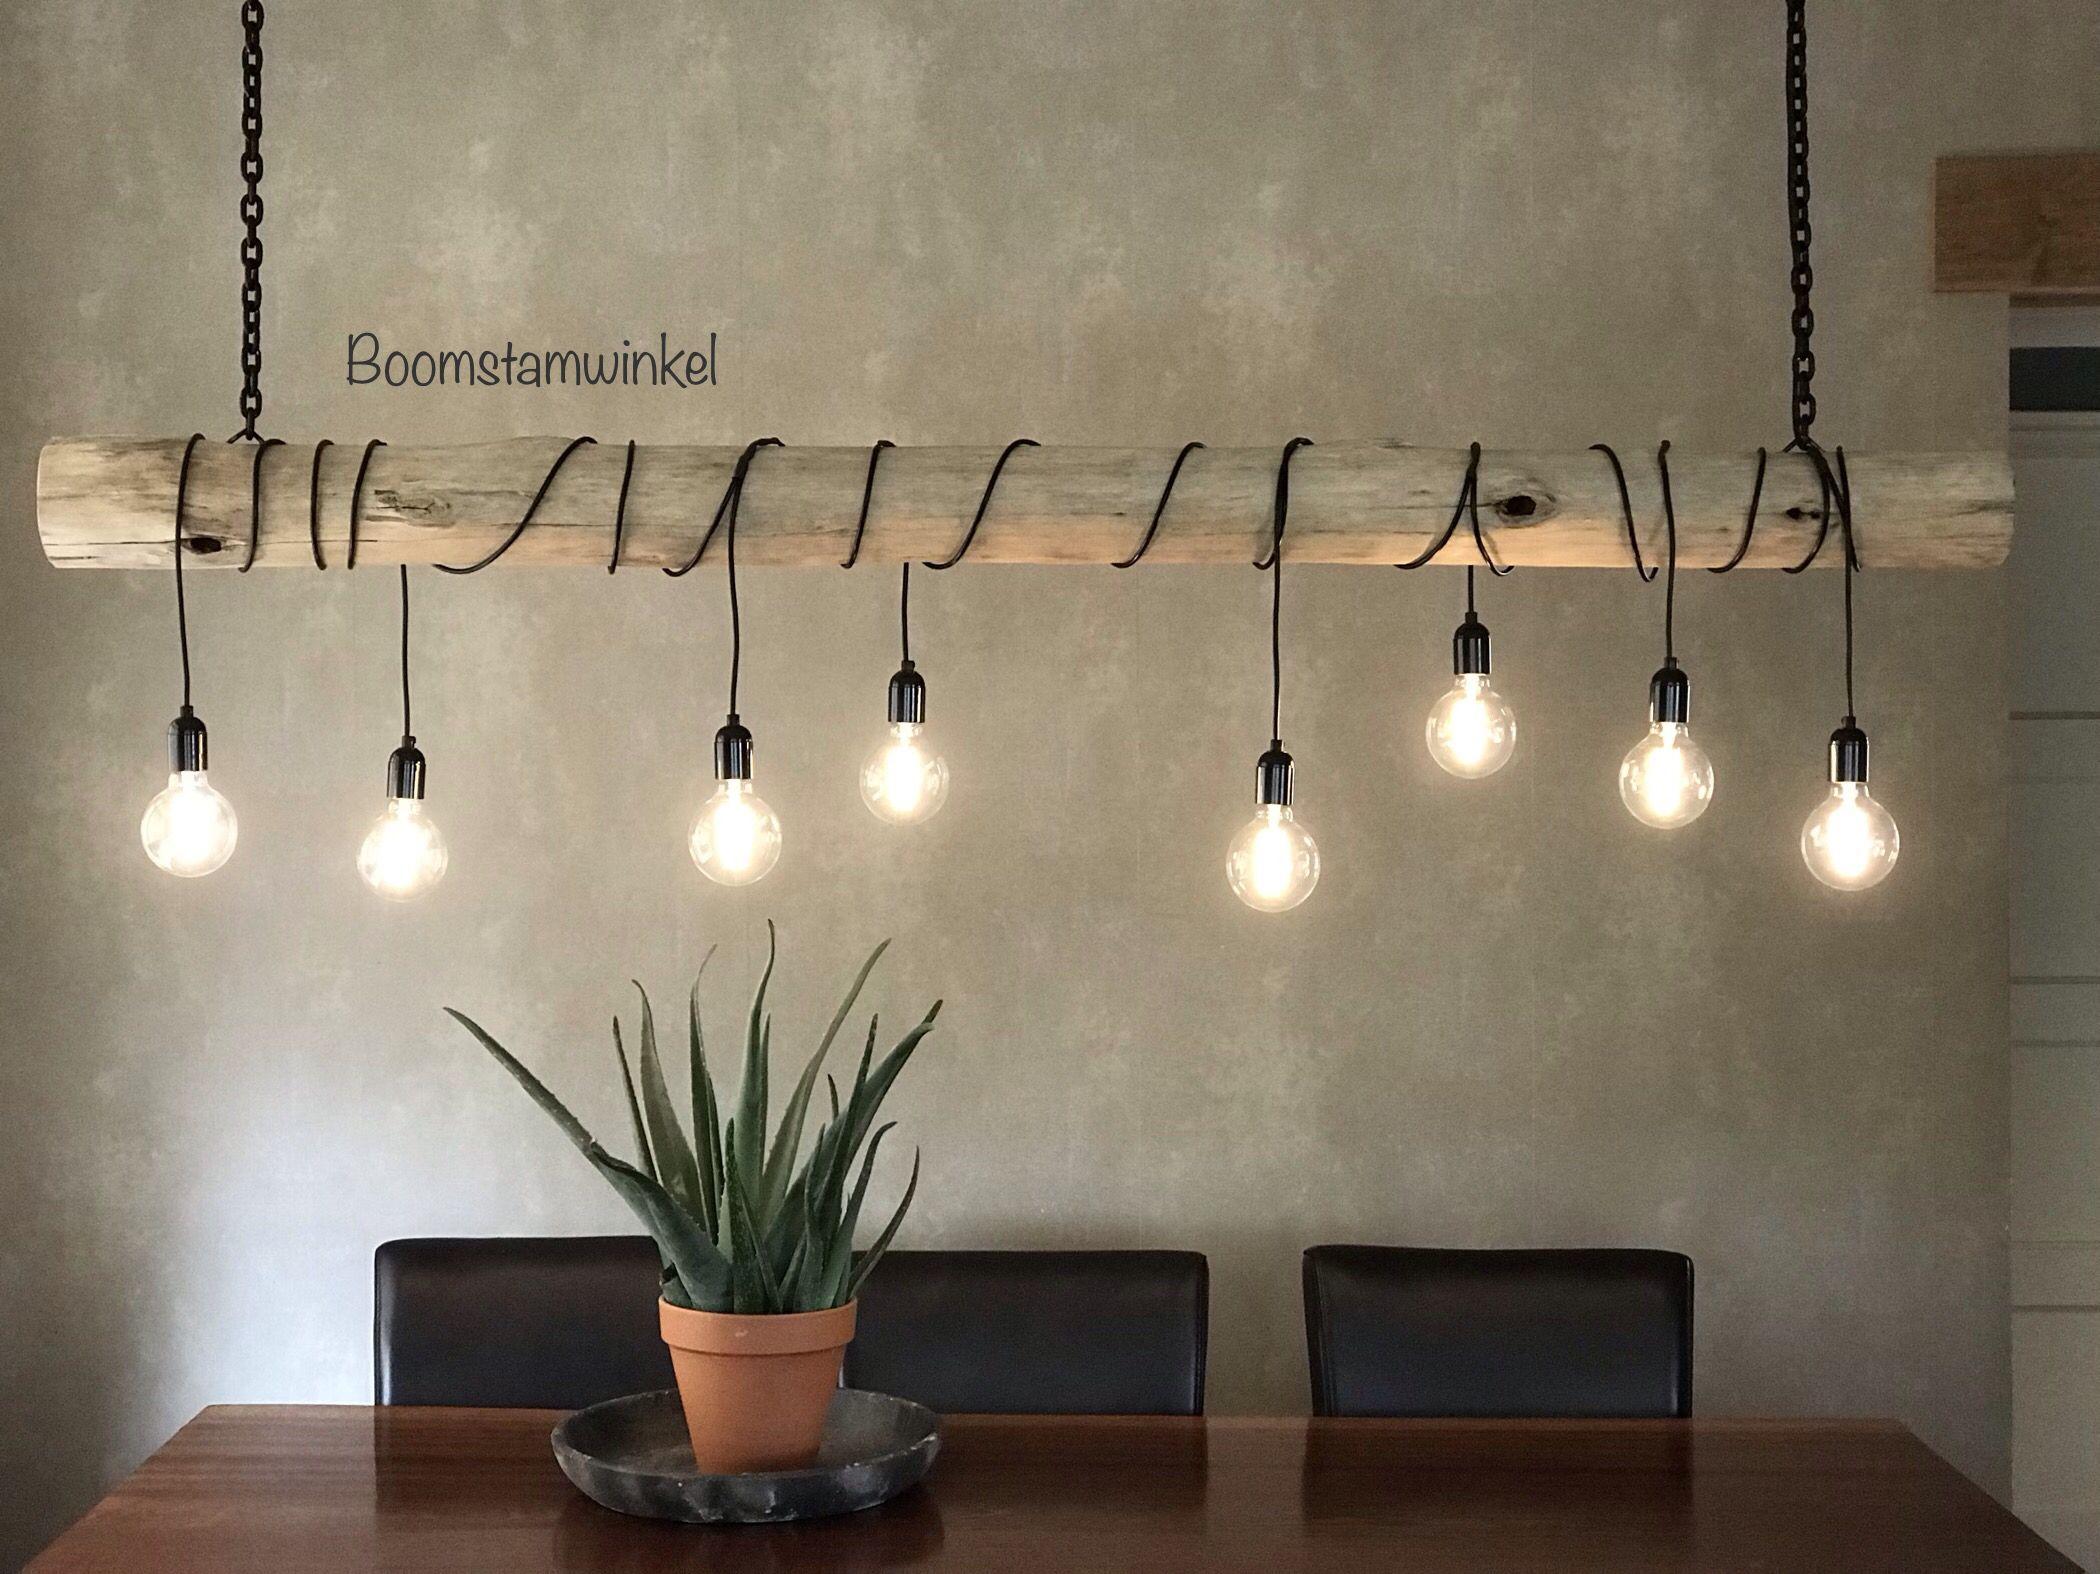 Boomstam Hanglamp Parel Hanglamp Boomstam Thuisdecoratie